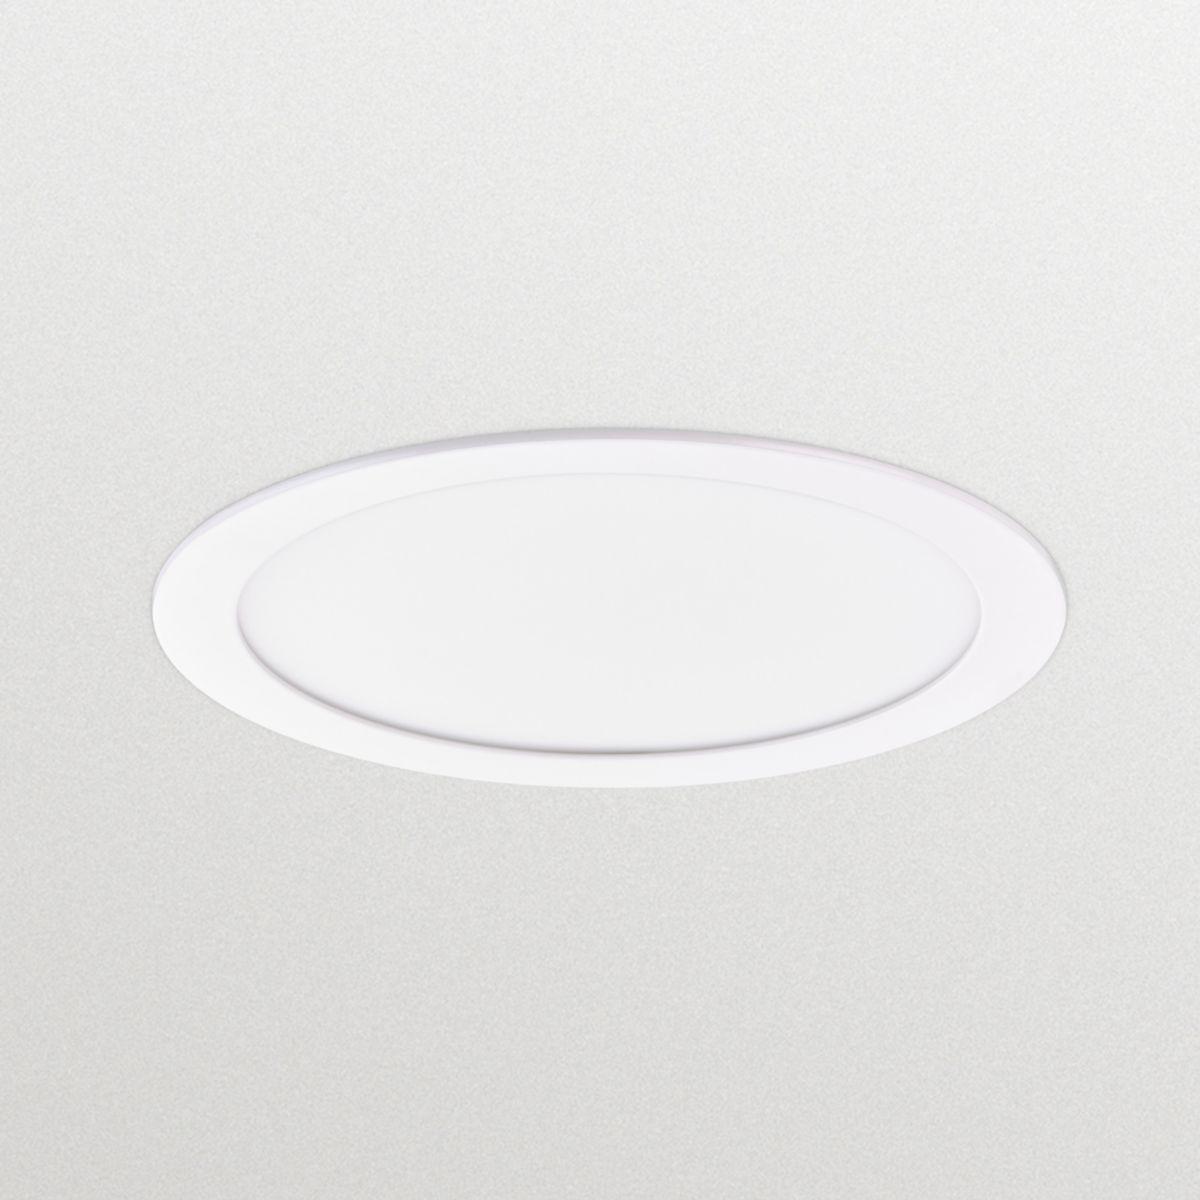 Plafoniere Led Philips : Dn b led s psu ii wh coreline slimdownlight philips lighting